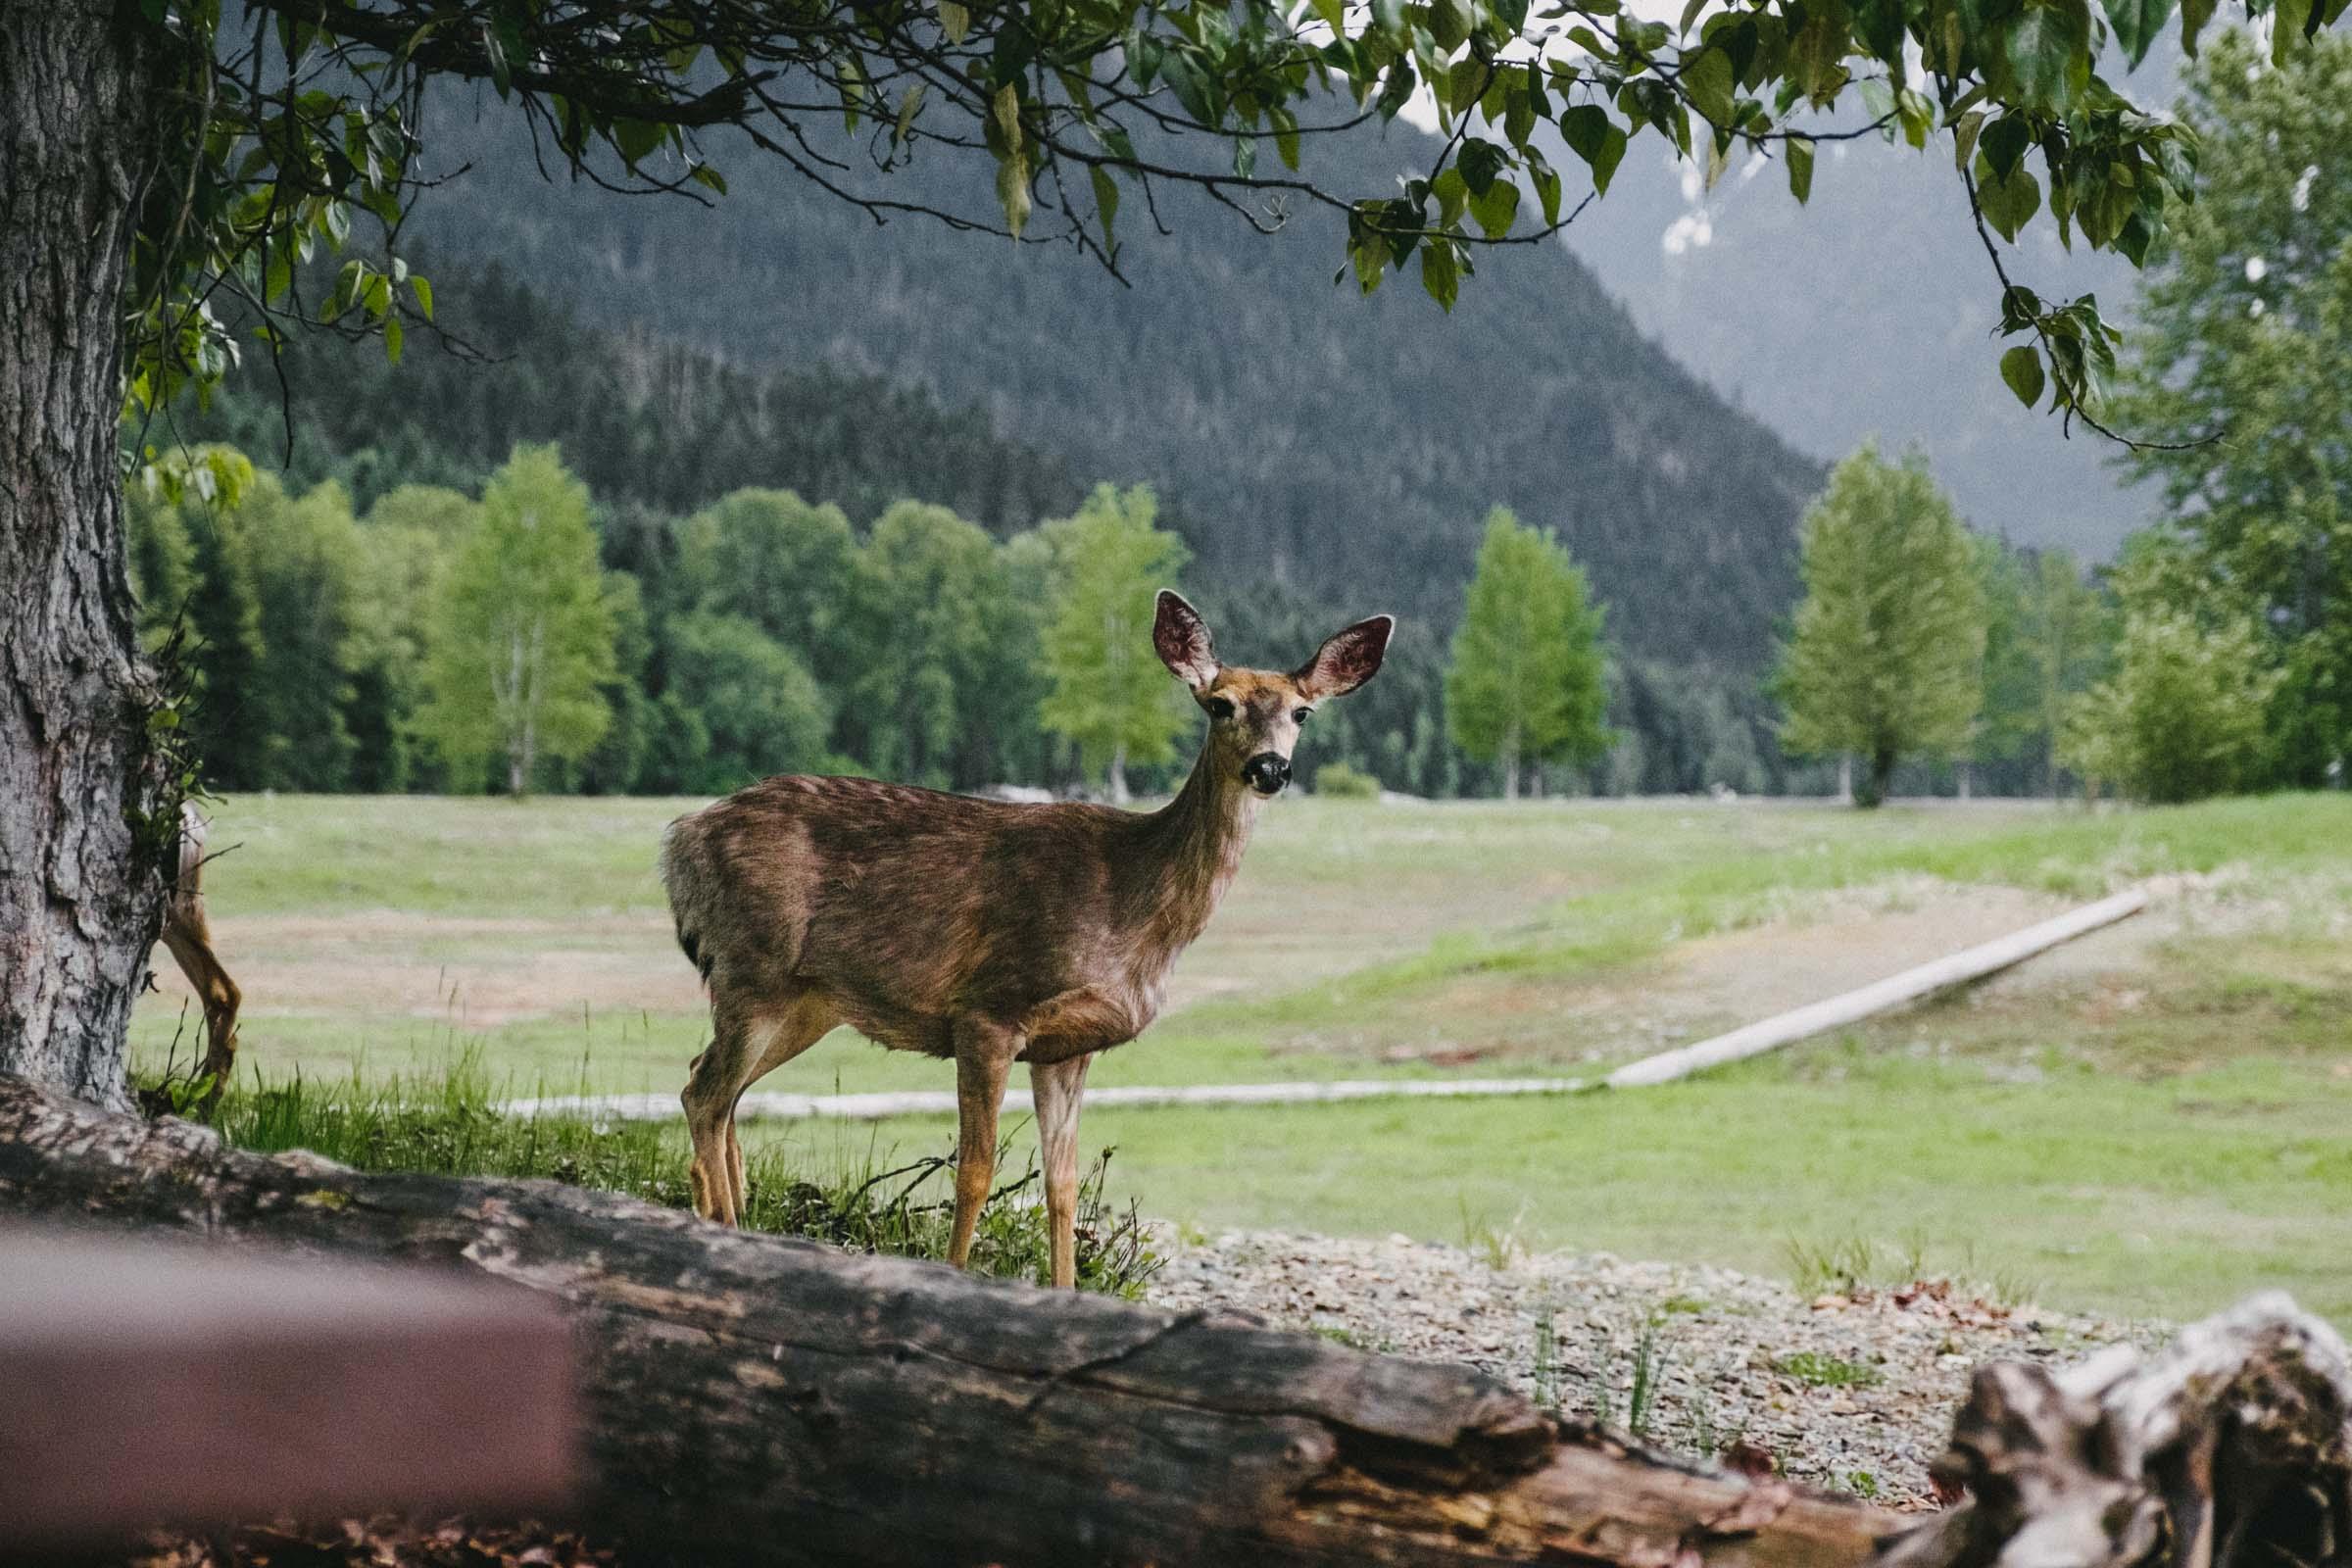 Skagit Valley wildlife